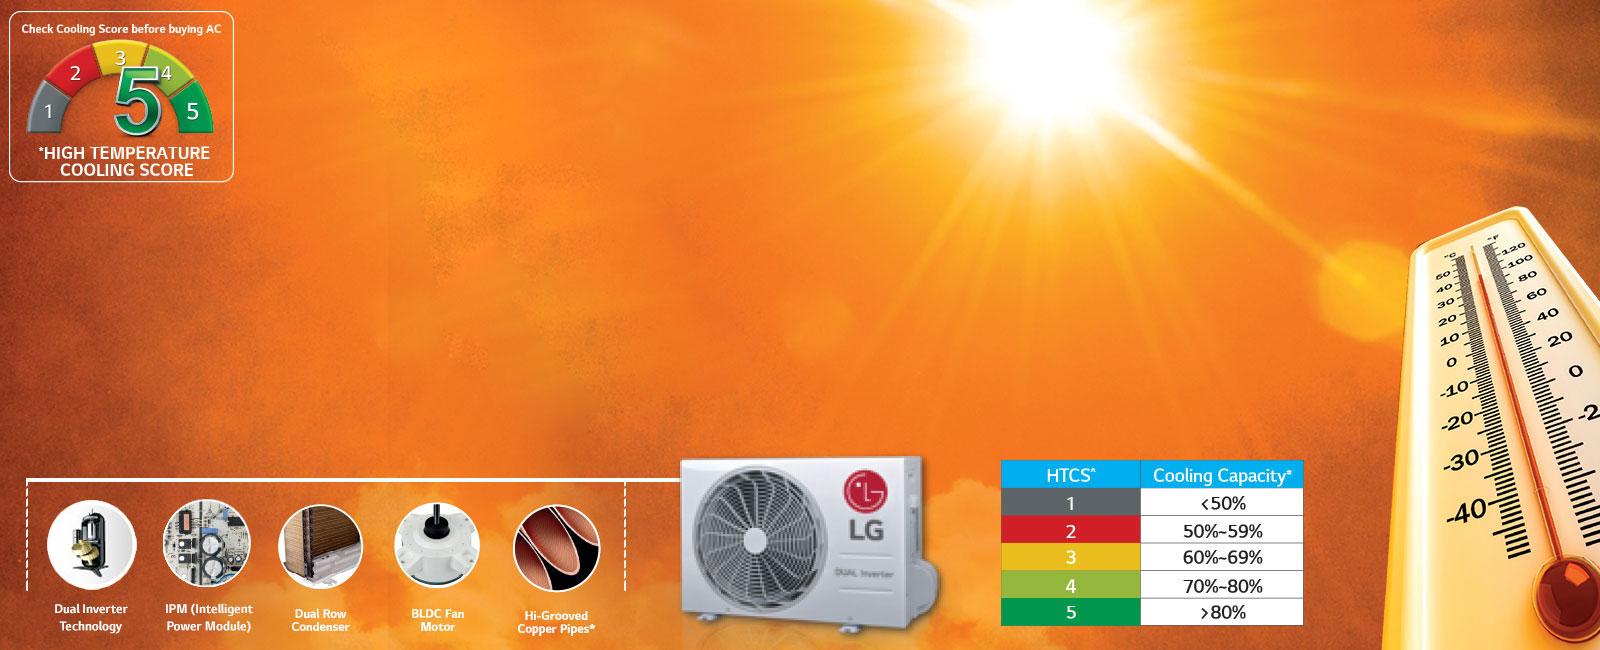 LG LS-Q18CNZD high temperature cooling score